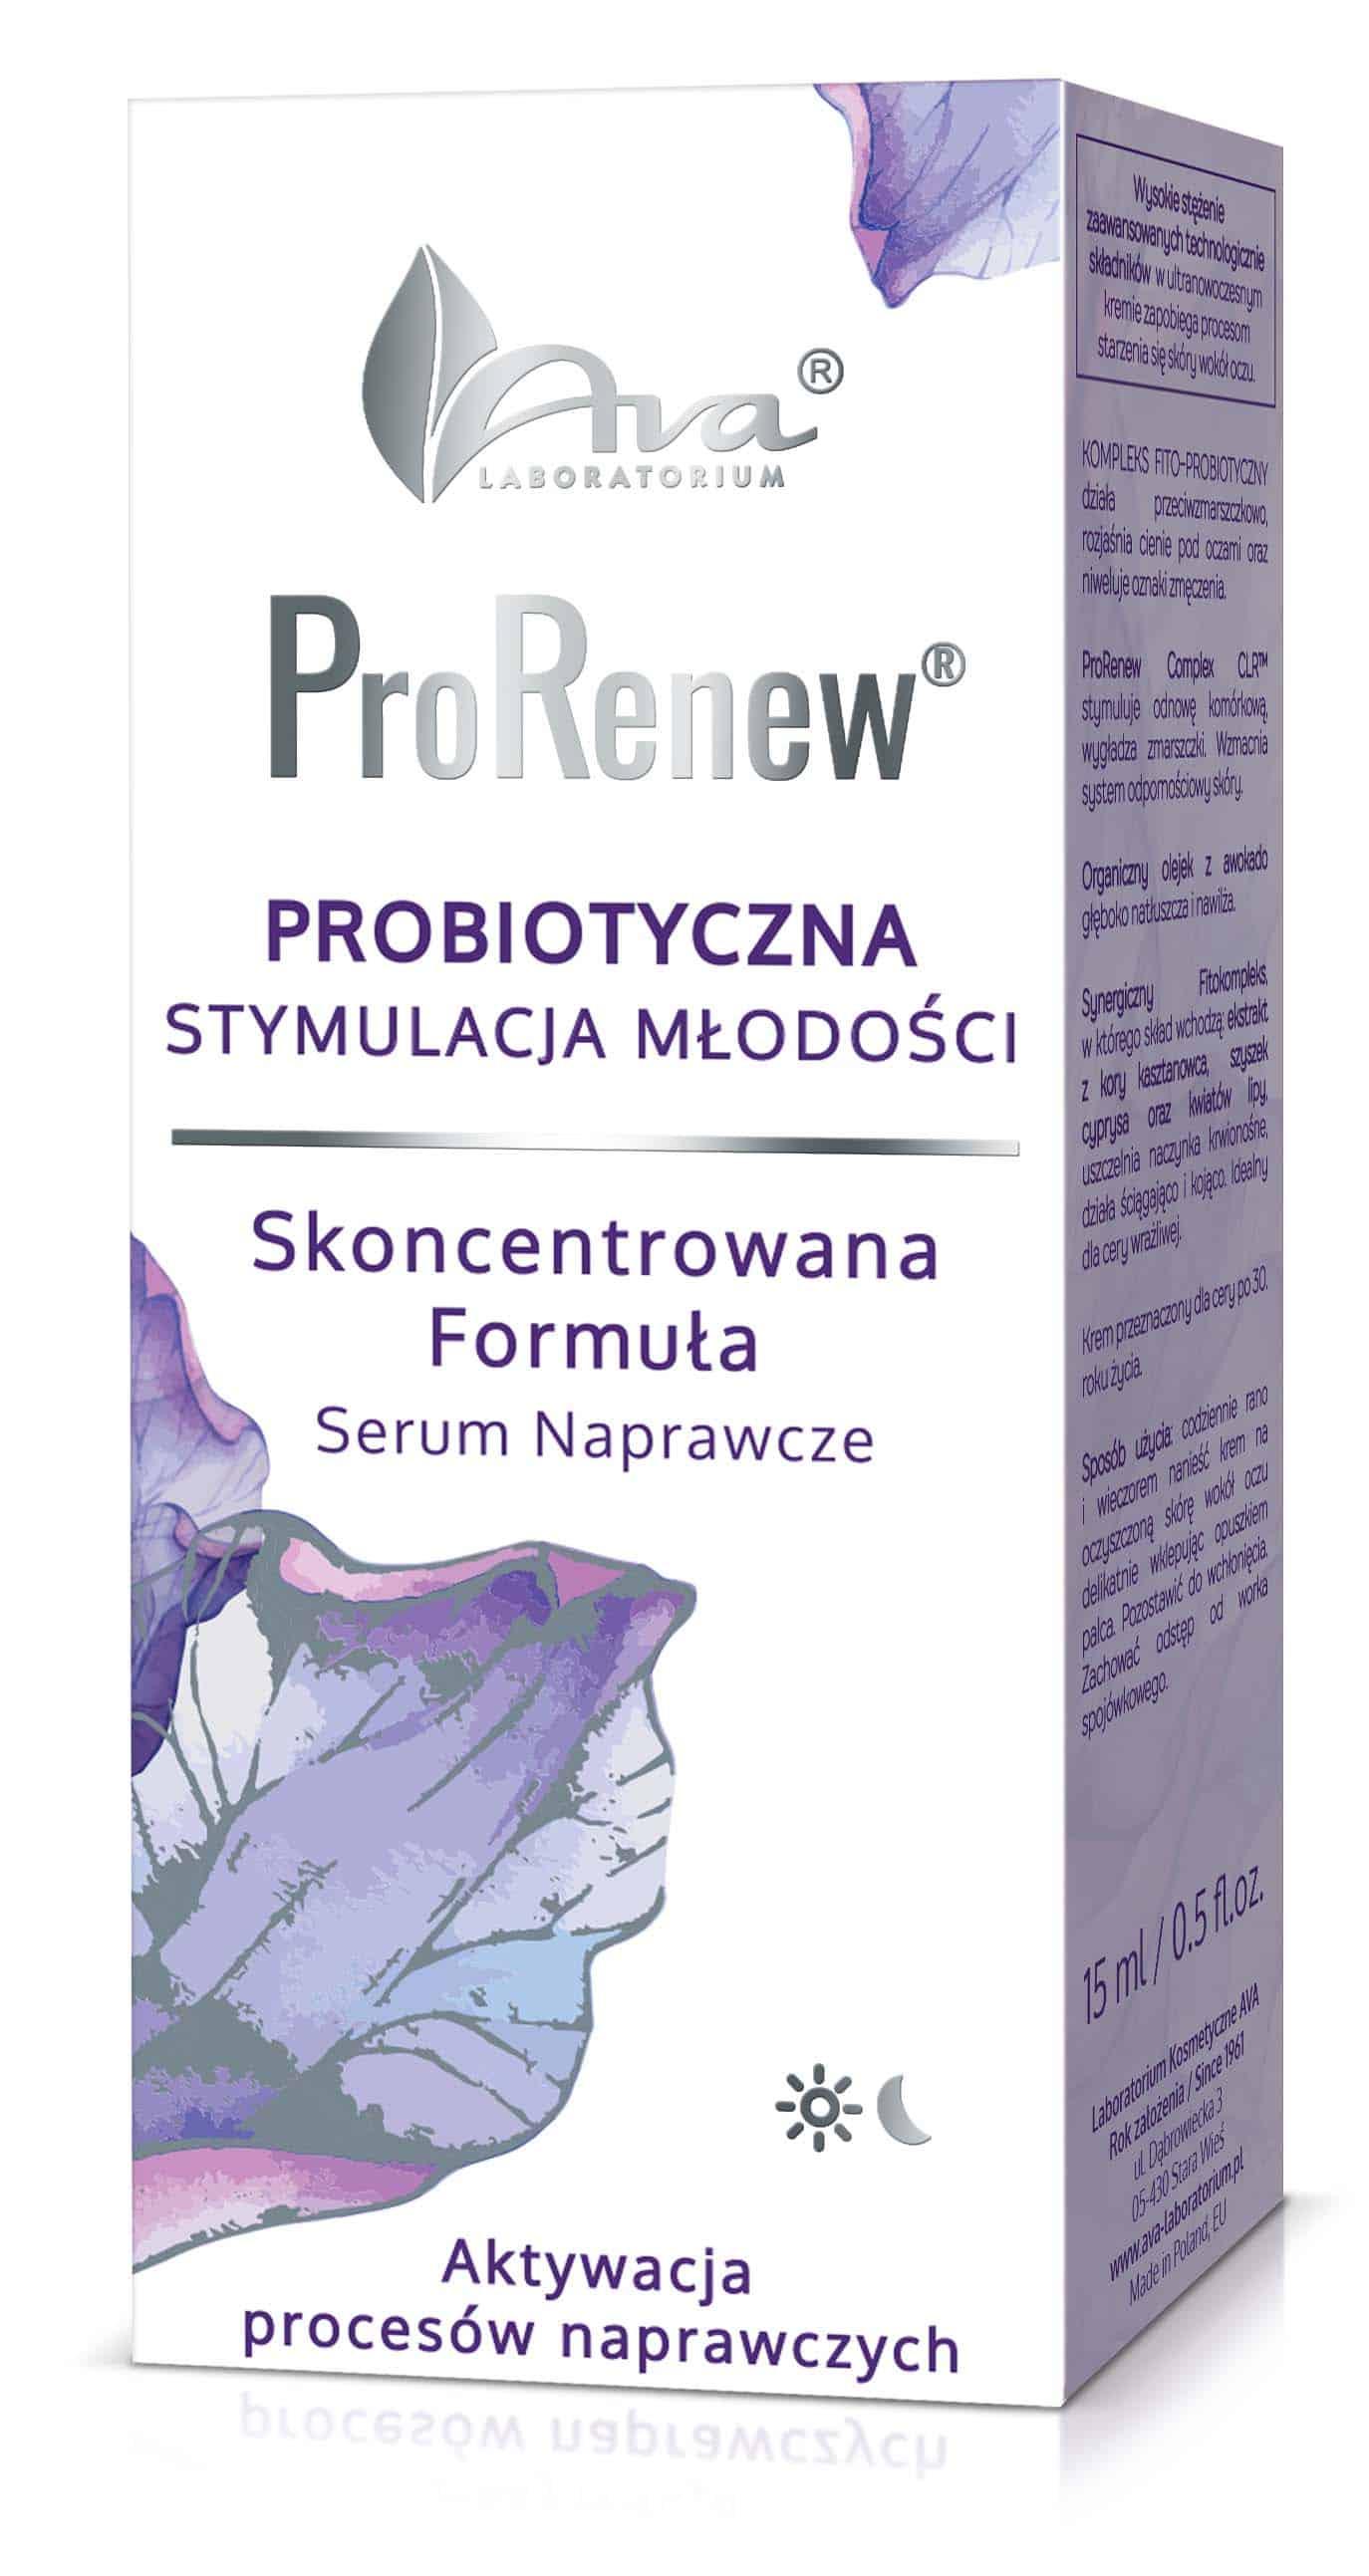 ProRenew_serum_kartonik_wizu_PL